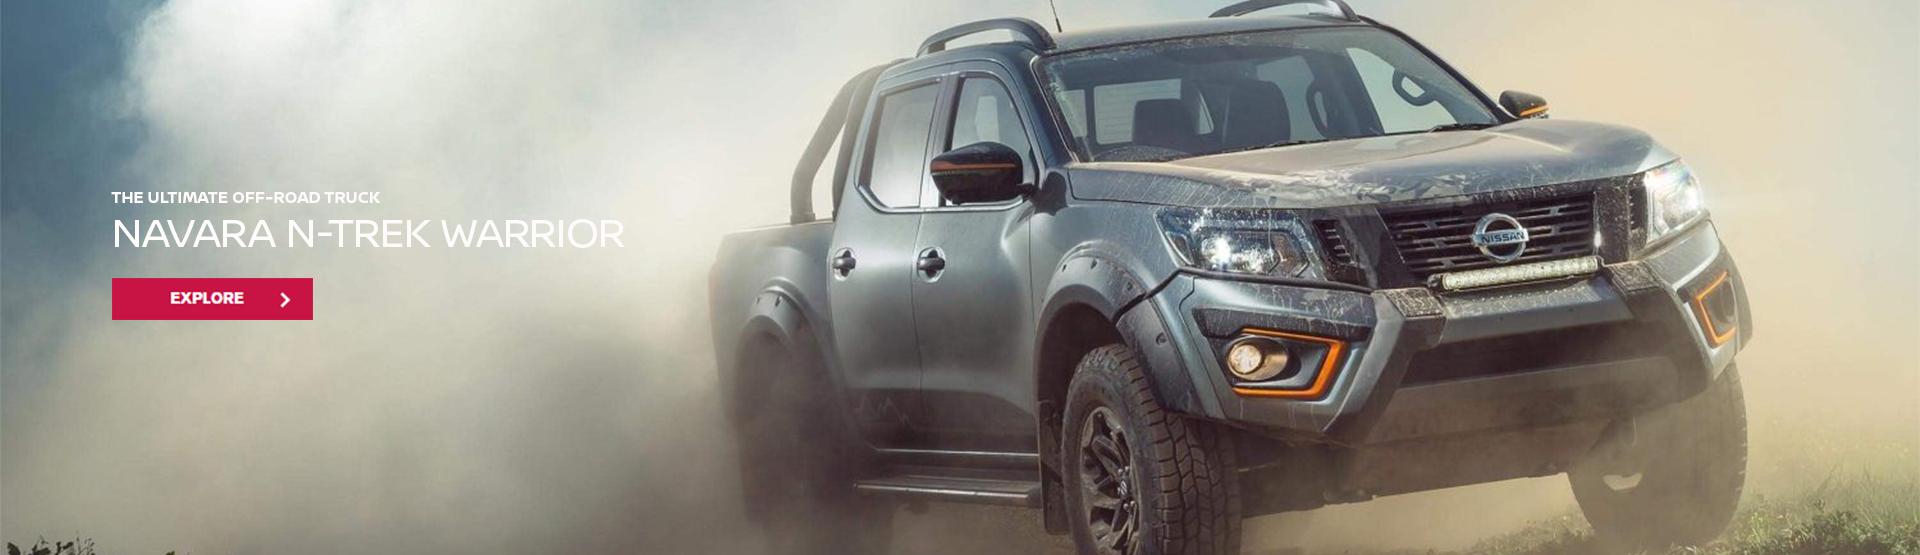 Nissan Narvara Warrior Exlpore now